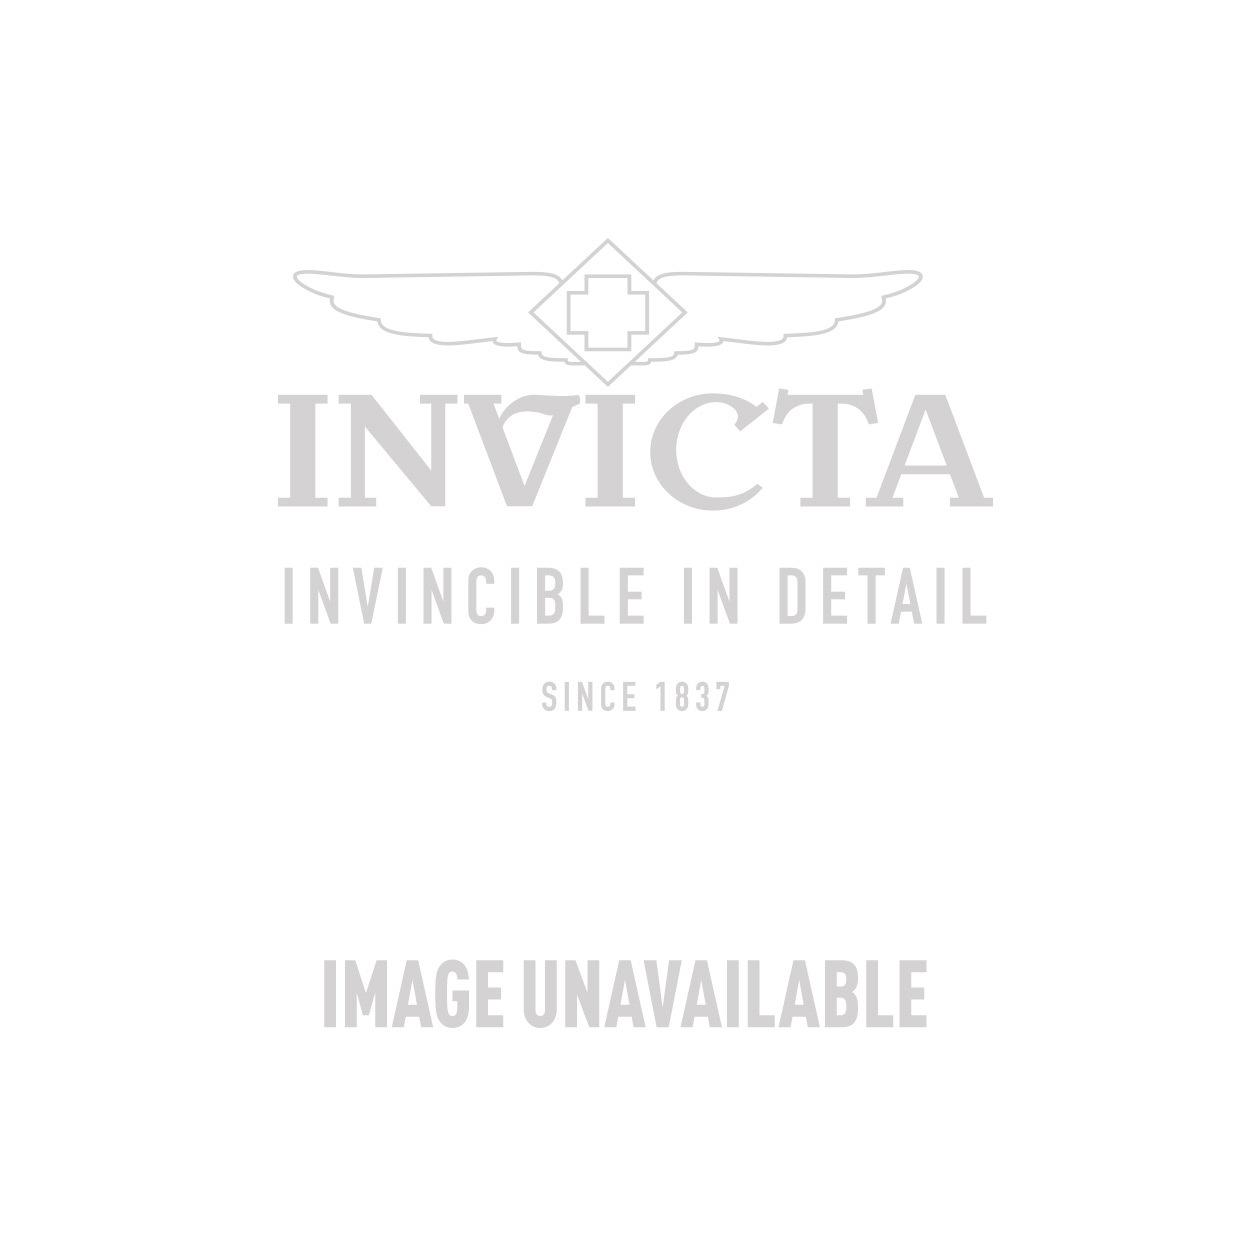 Invicta Corduba Quartz Watch - Gold, Gunmetal case with Cognac tone Leather band - Model 18936